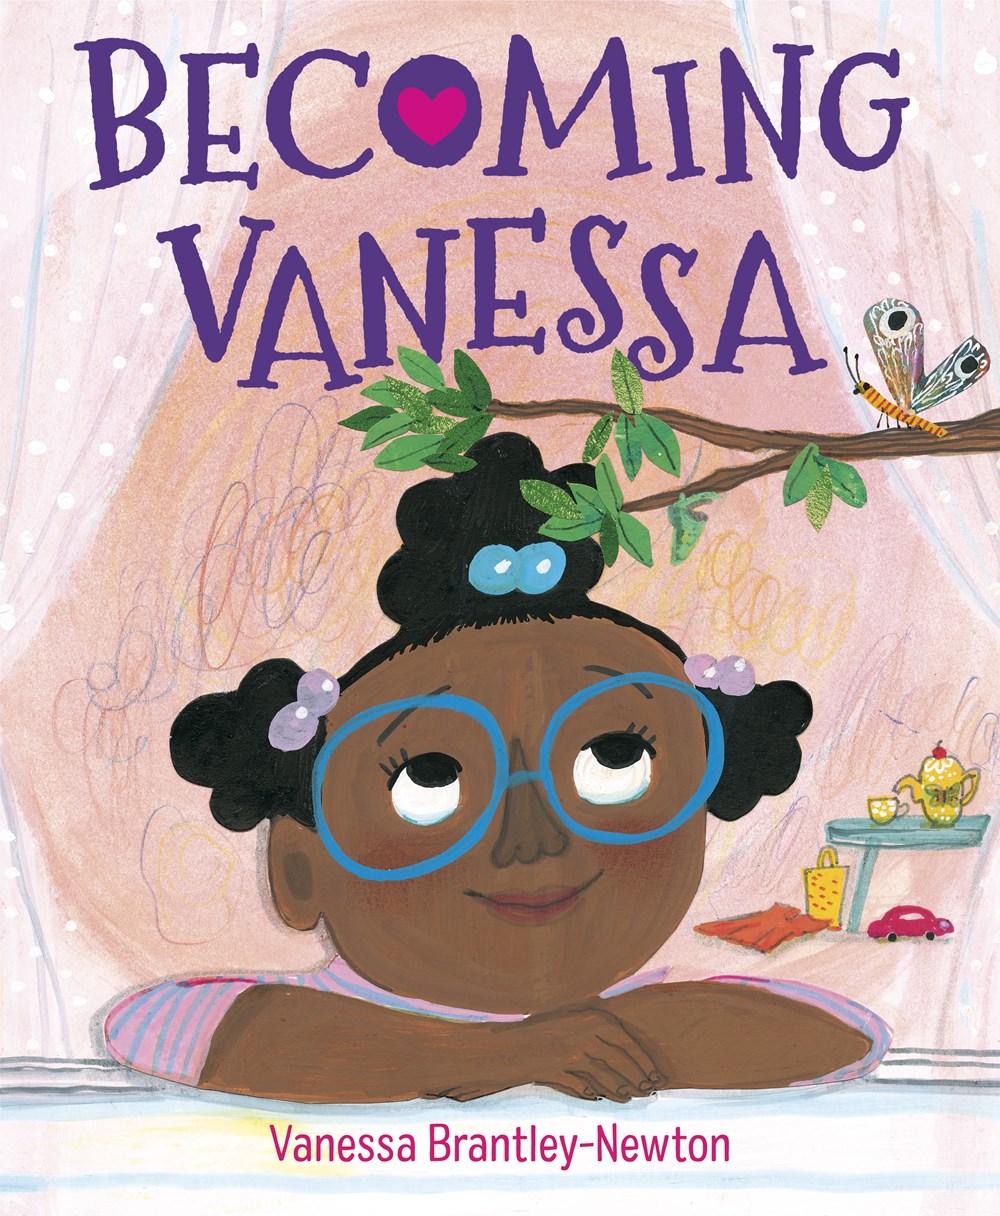 Becoming Vanessa by Vanessa Brantley-Newton